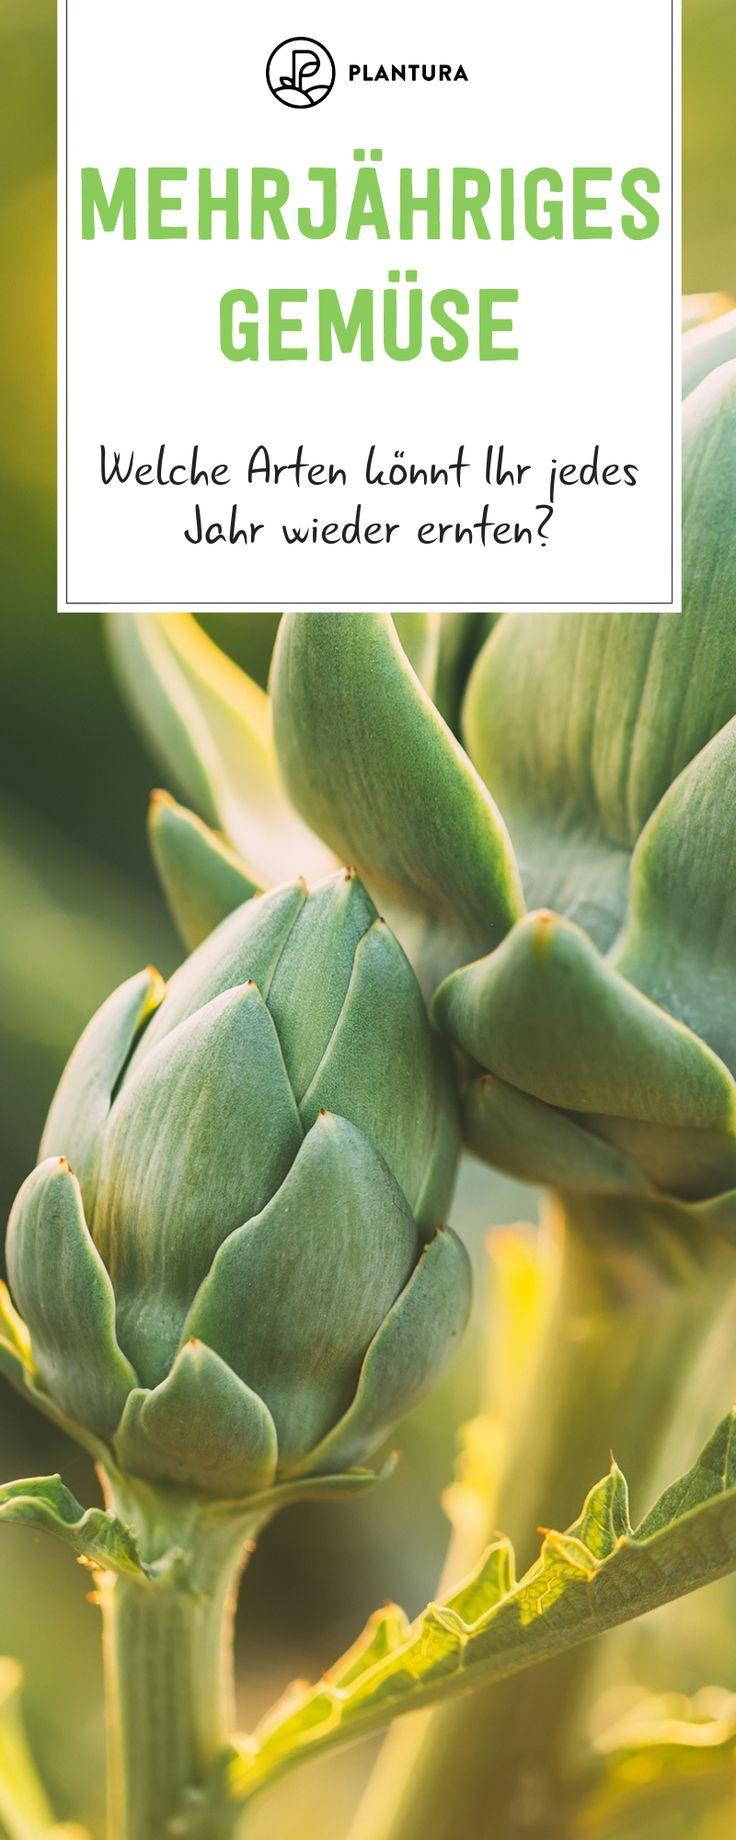 Mehrjähriges Gemüse: Die 10 besten Arten – Plantura | Garten Ideen & Tipps | Gemüse, Obst, Kräuter